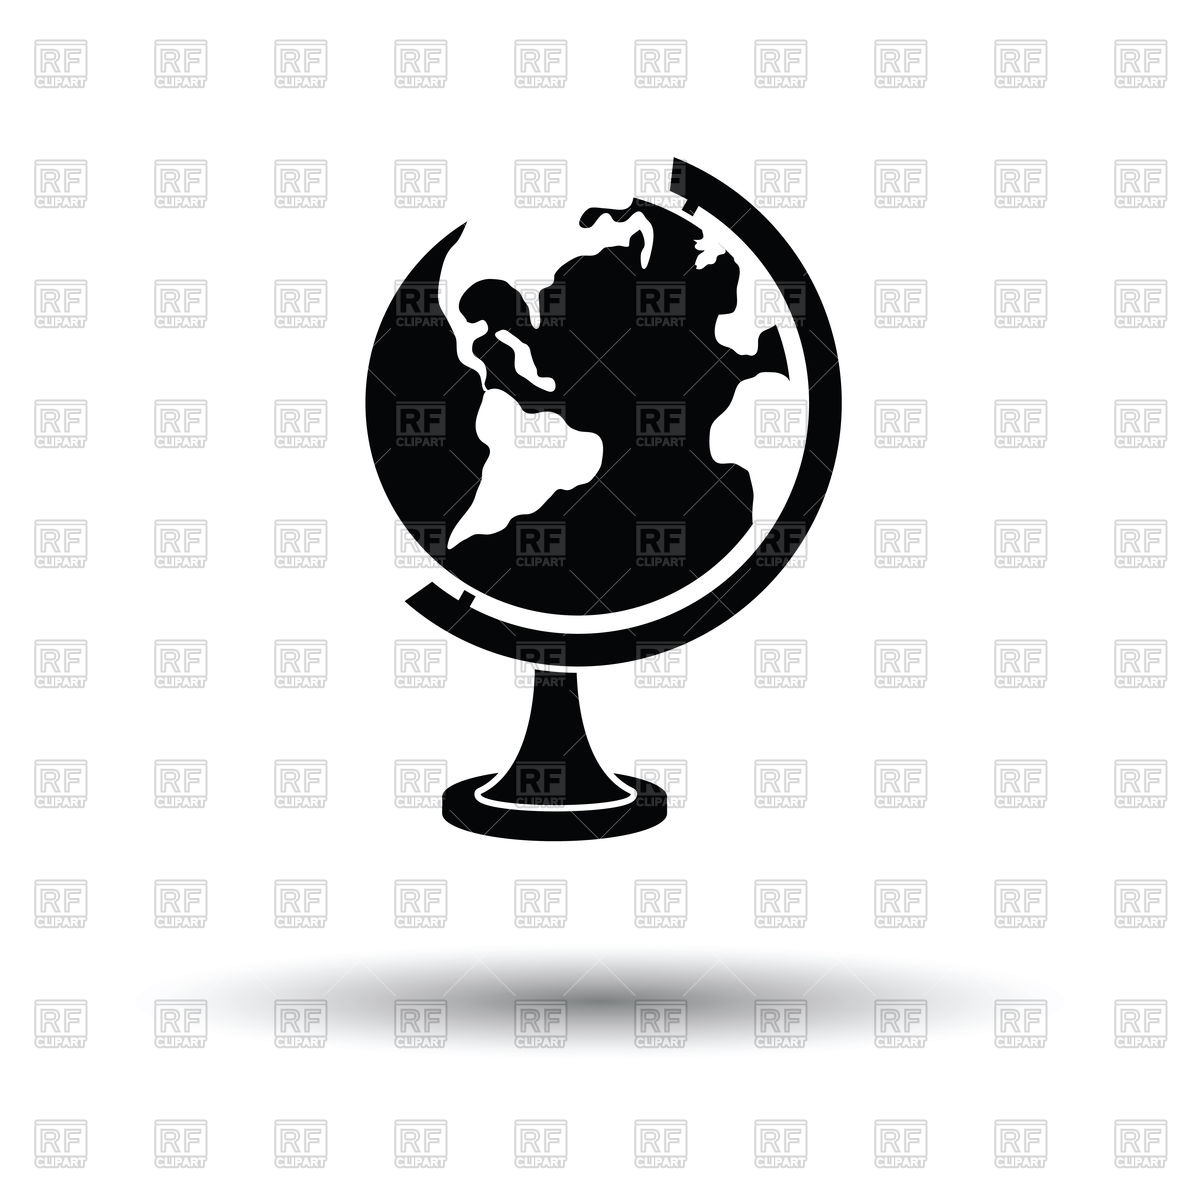 1200x1200 Globe Icon Vector Image Vector Artwork Of Signs, Symbols, Maps